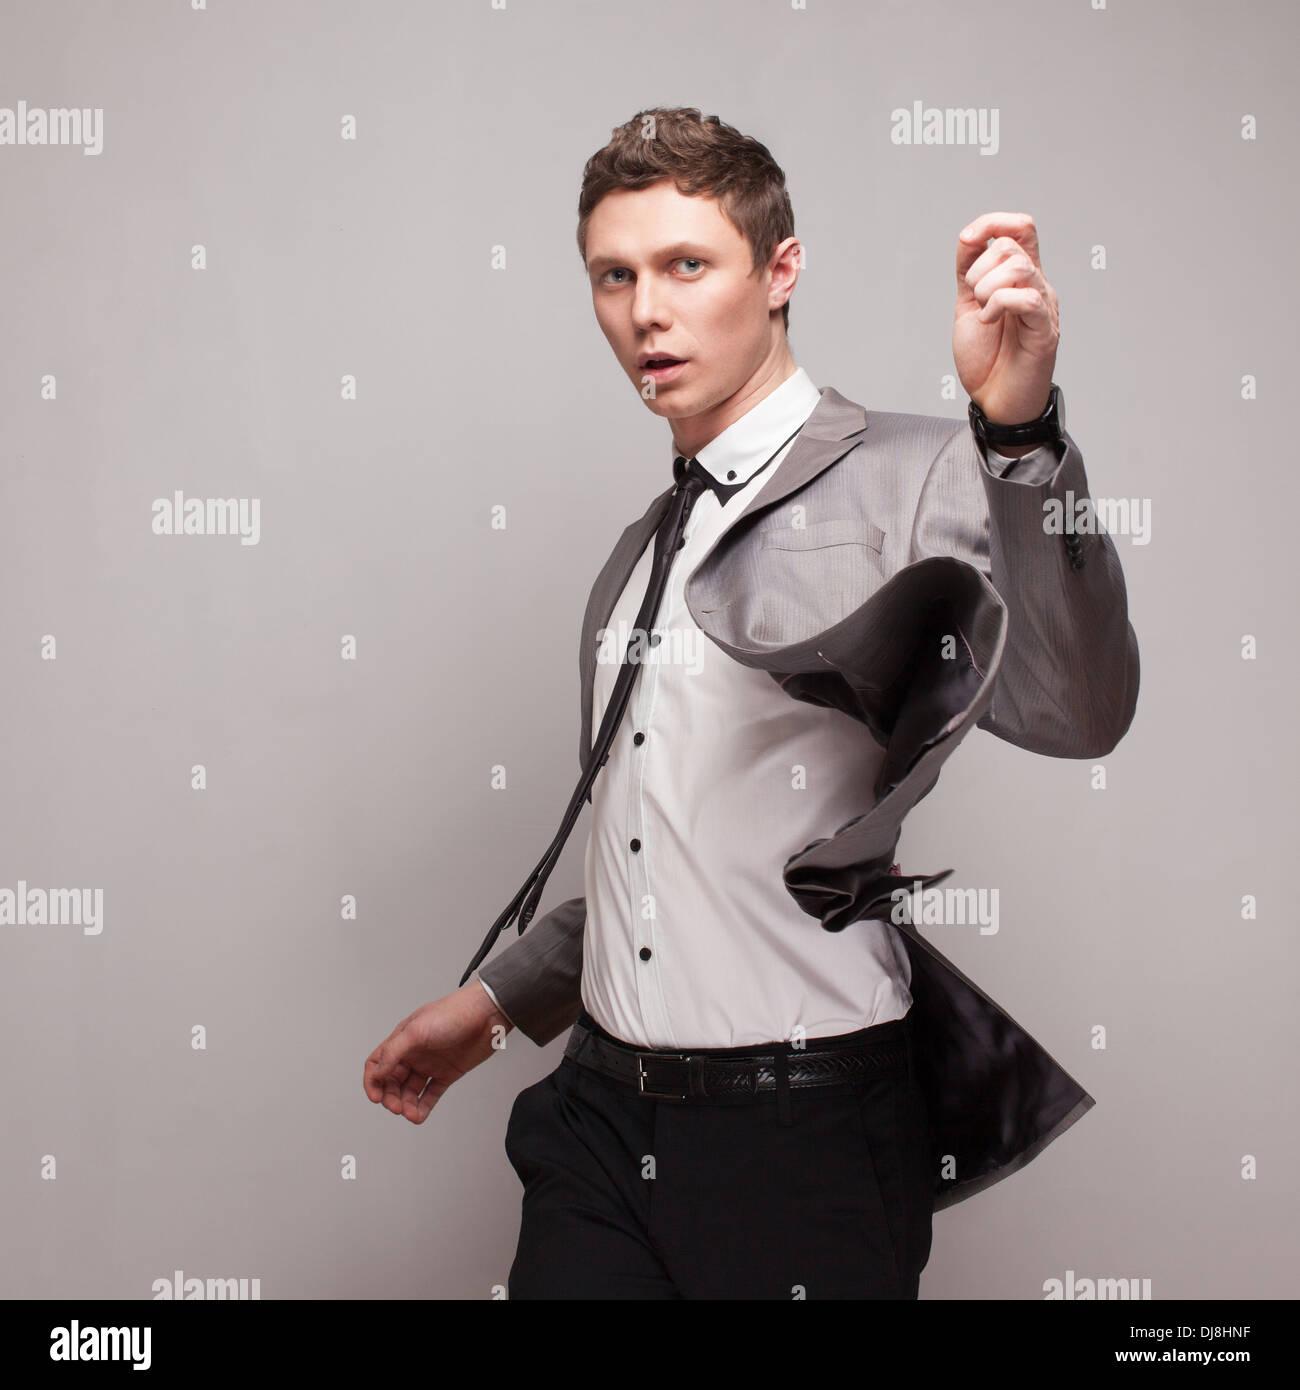 Fashionable business guy - Stock Image